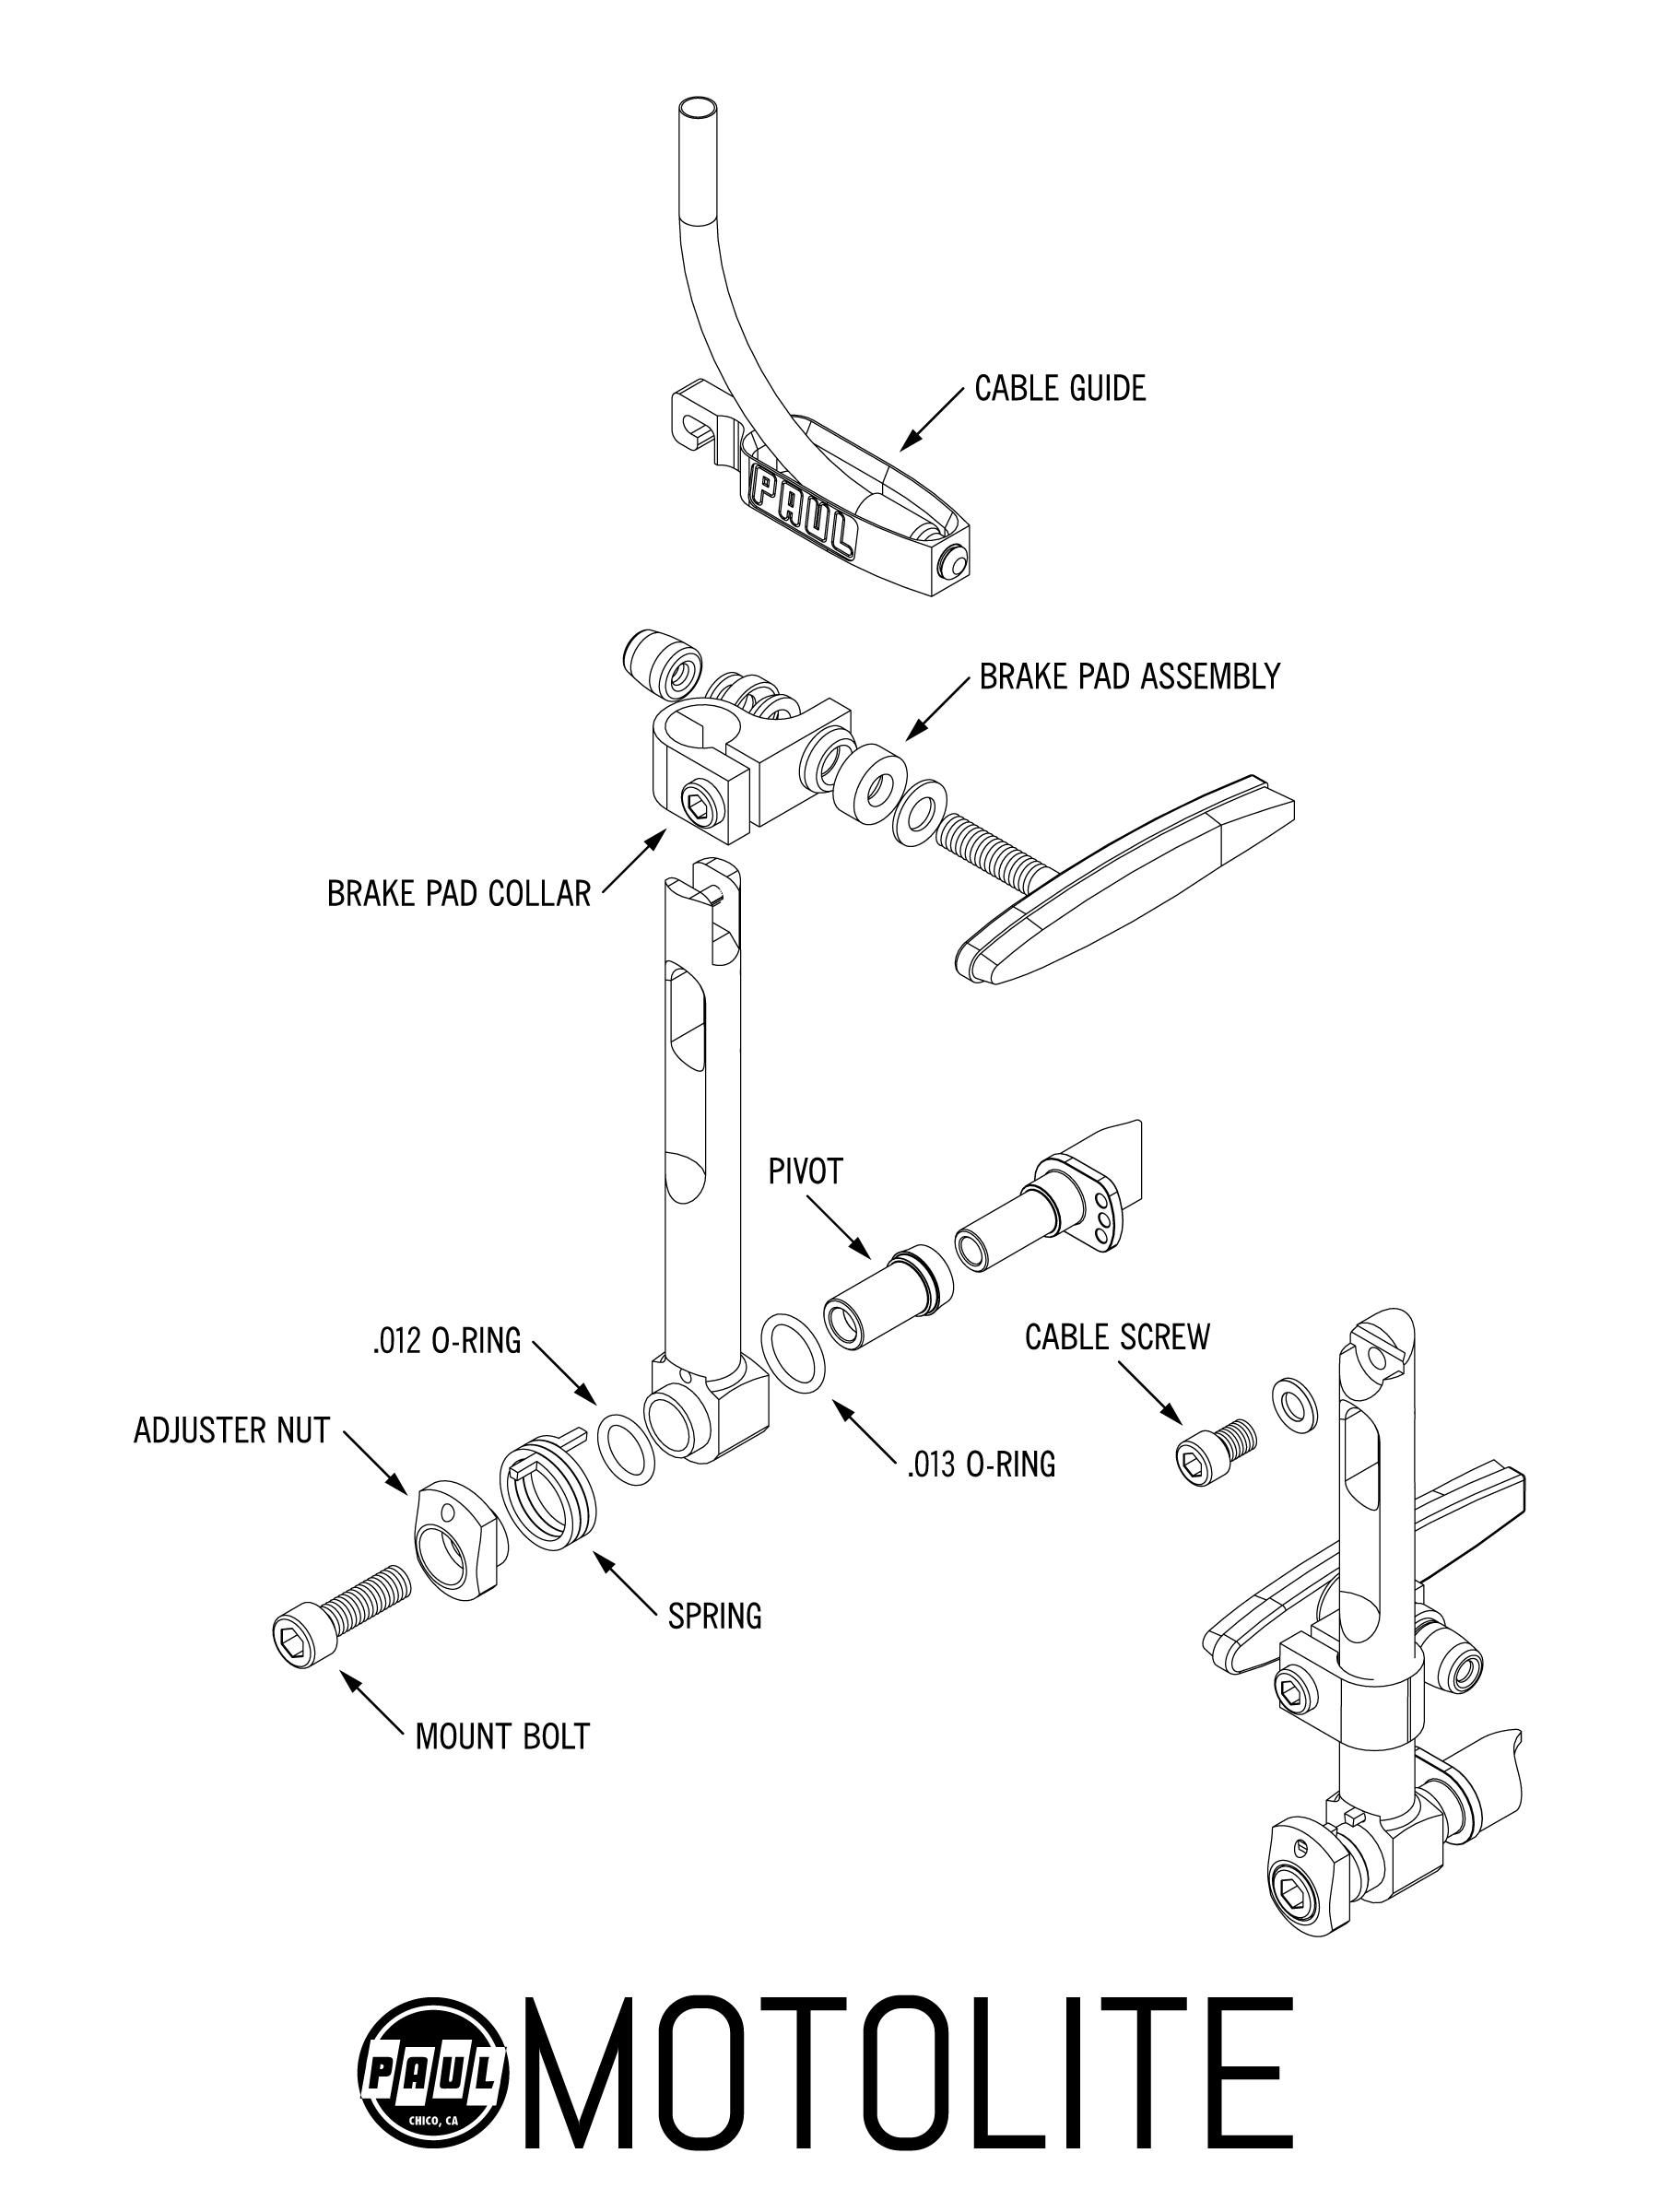 Motolite Paul Component Engineering